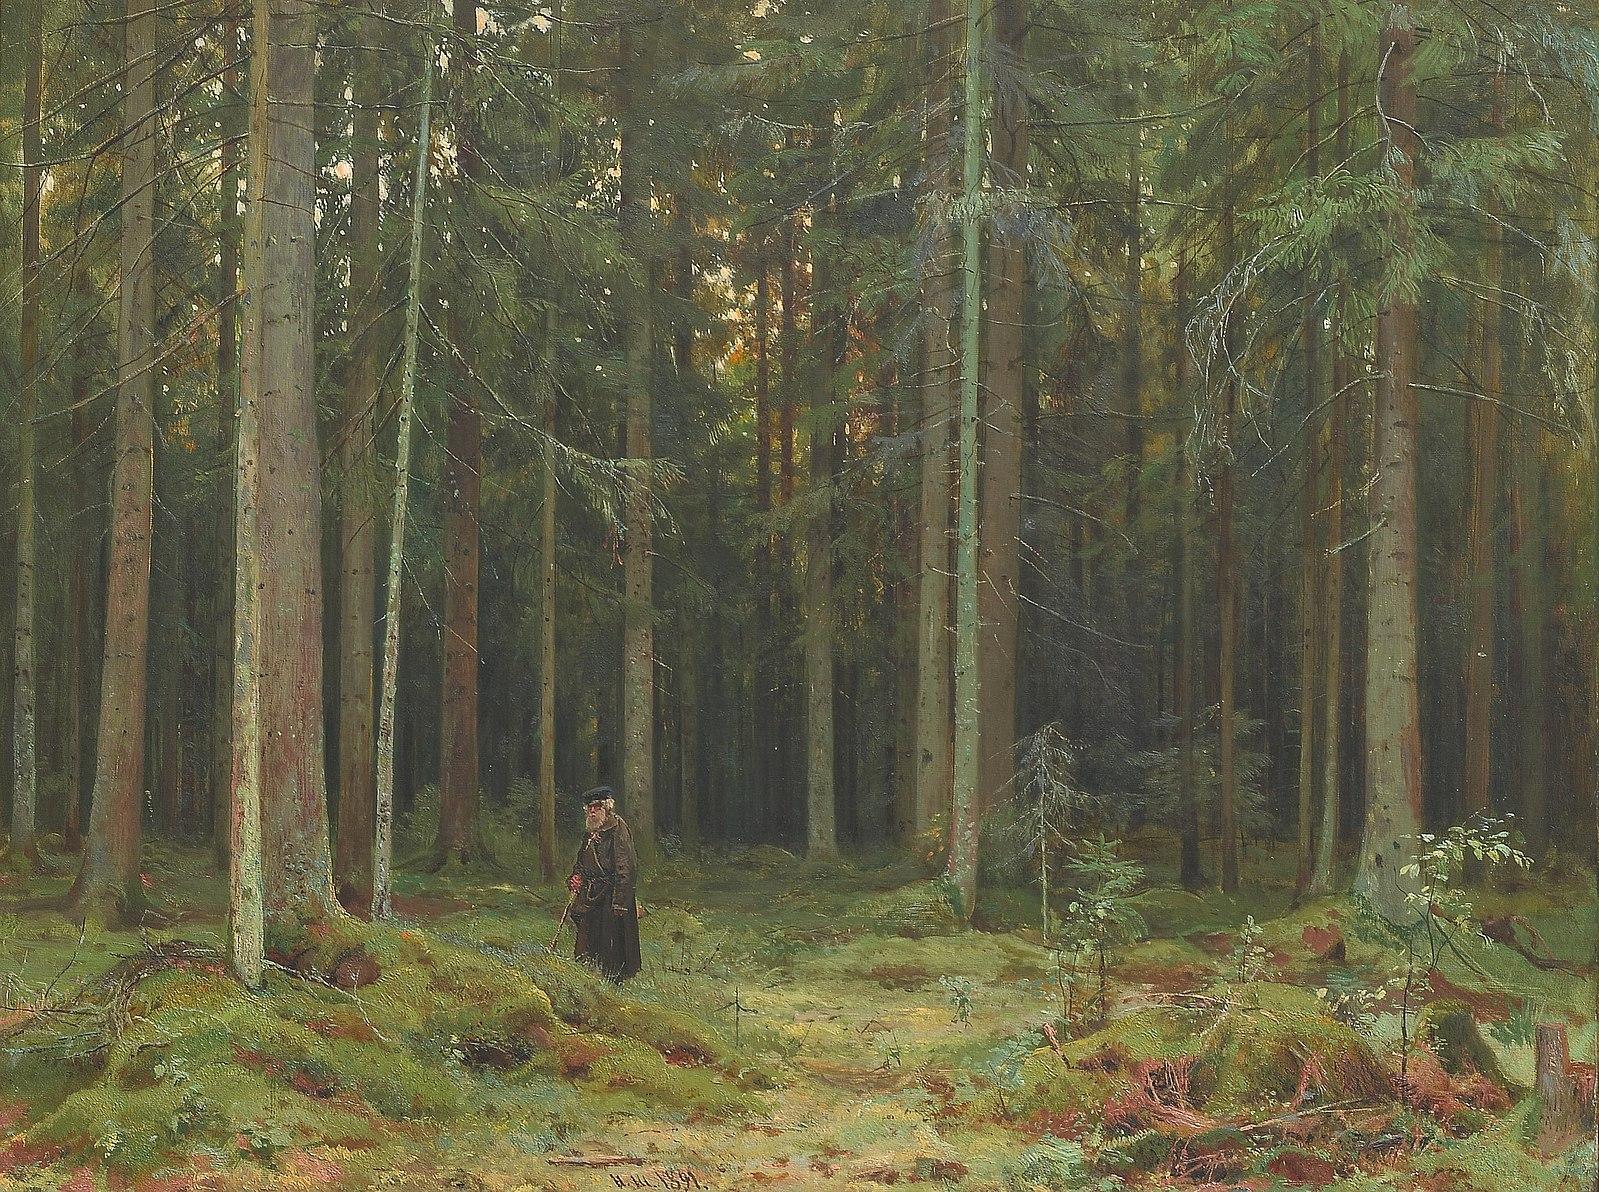 Ivan Shishkin , Countess Mordvinova' s  Wood  (1893) Oil on canvas. 84 х 110.5cm. Tretyakov Gallery, Moscow.  https://www.tretyakovgallery.ru/en/collection/v-lesu-grafini-mordvinovoy-petergof/